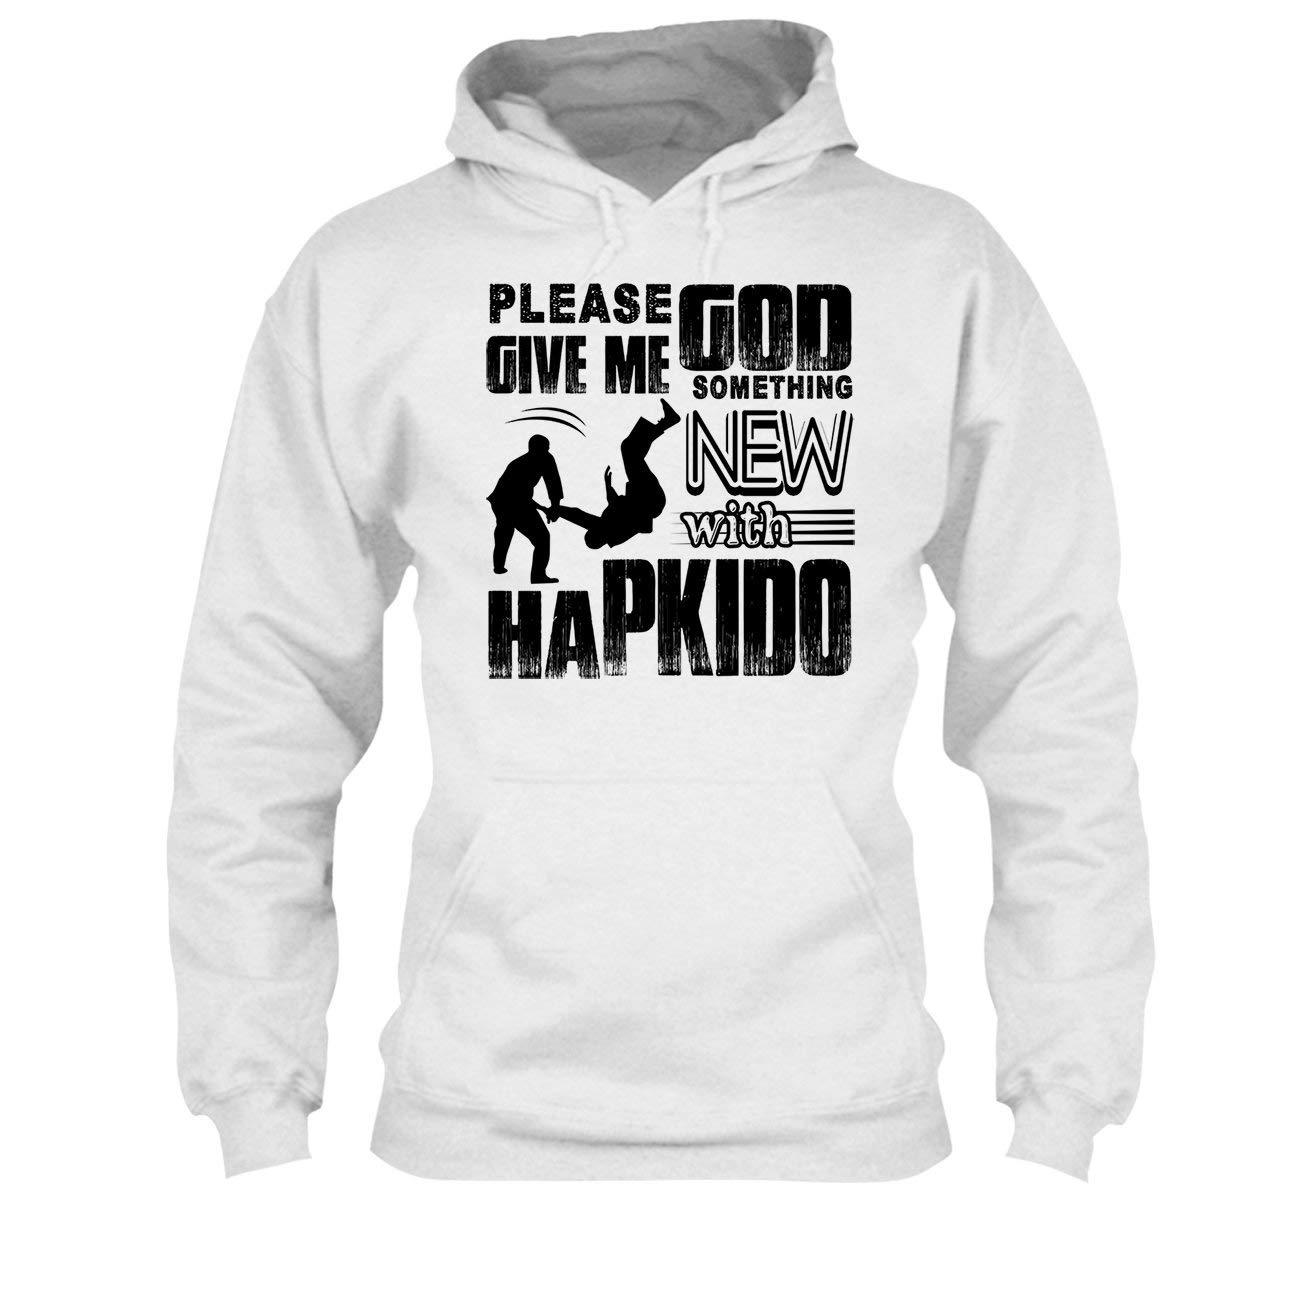 Tee Shirt Light Orange Please God Give Me Something New Hapkido Tshirt Sweatshirt Design